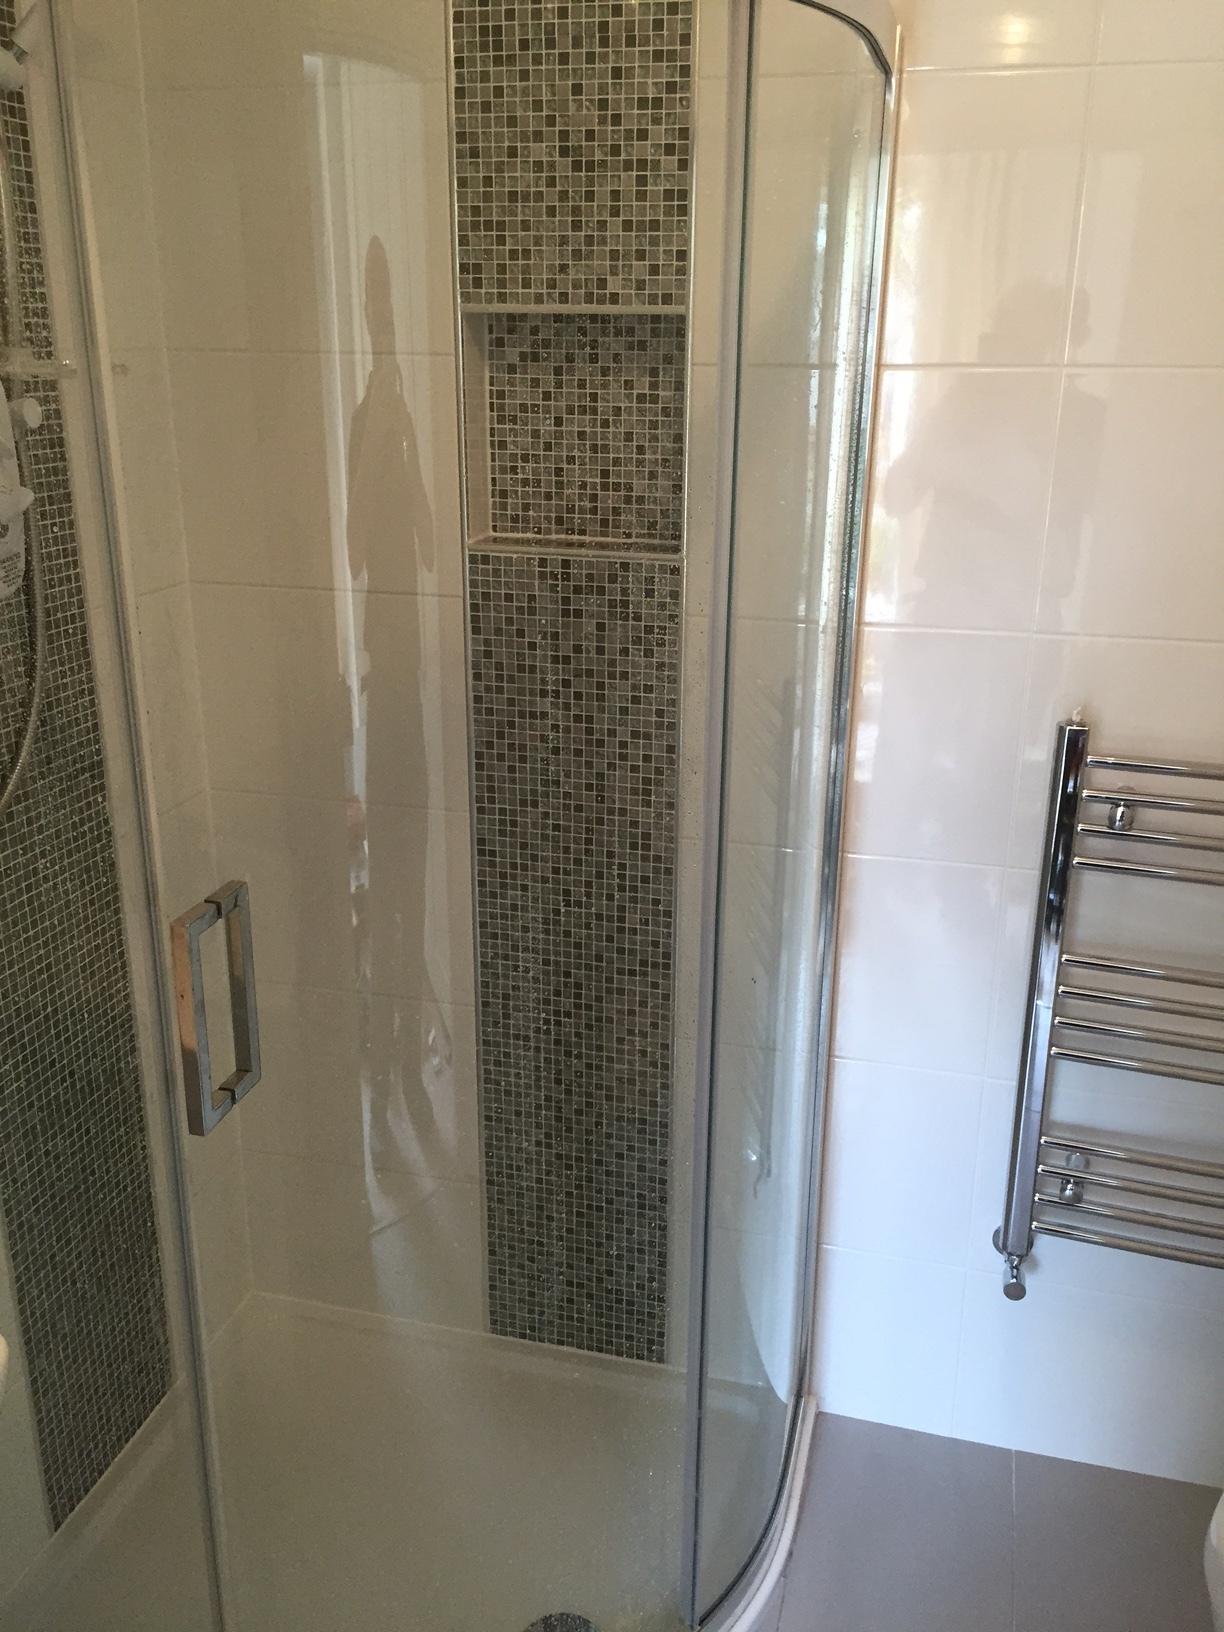 Bathroom Design Kildare kildare wc renovation - cleary bathroom design - cleary bathroom